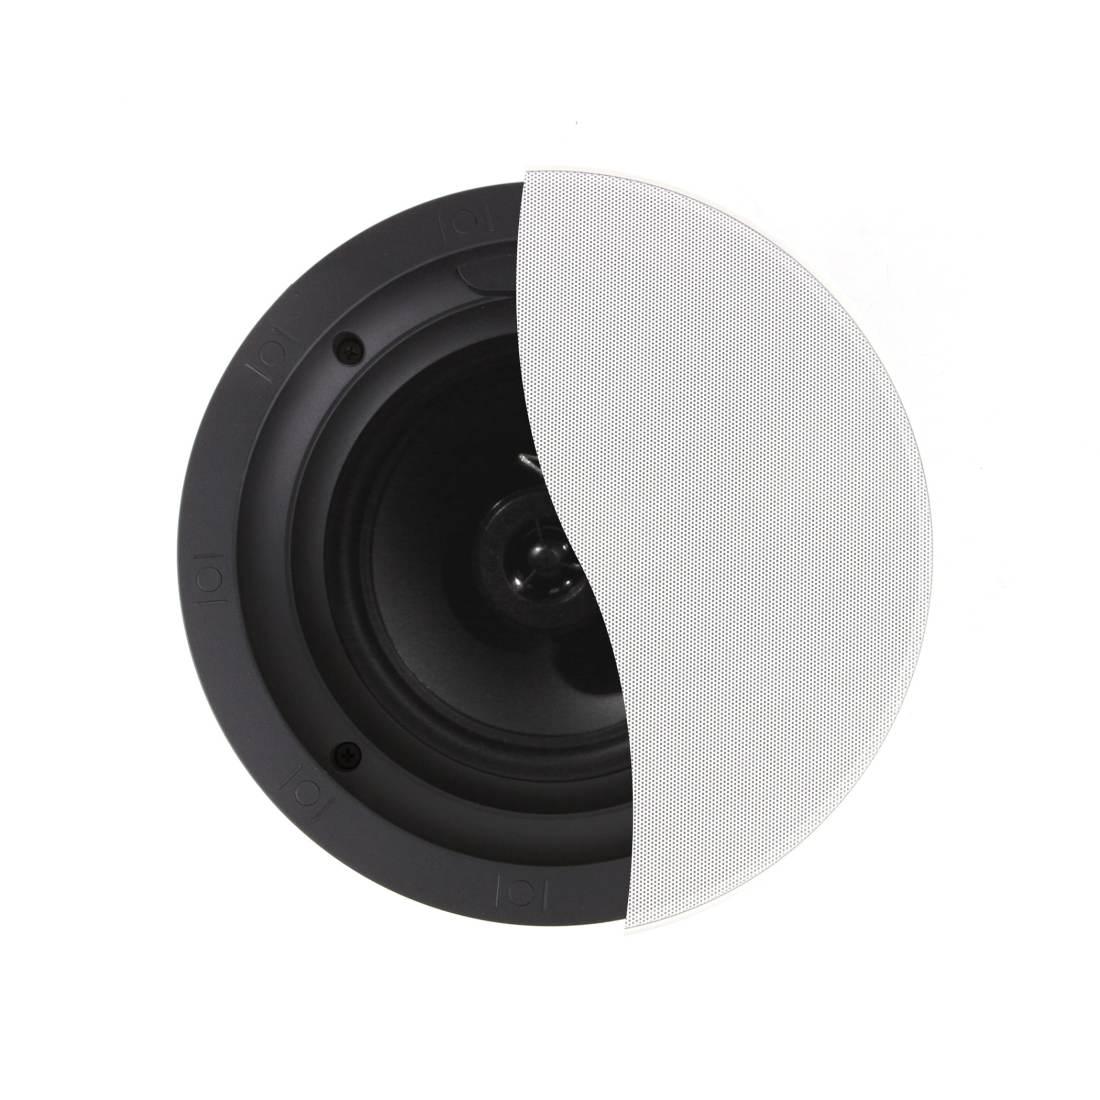 10 Inch Cerwin Vega Replacement Speakers